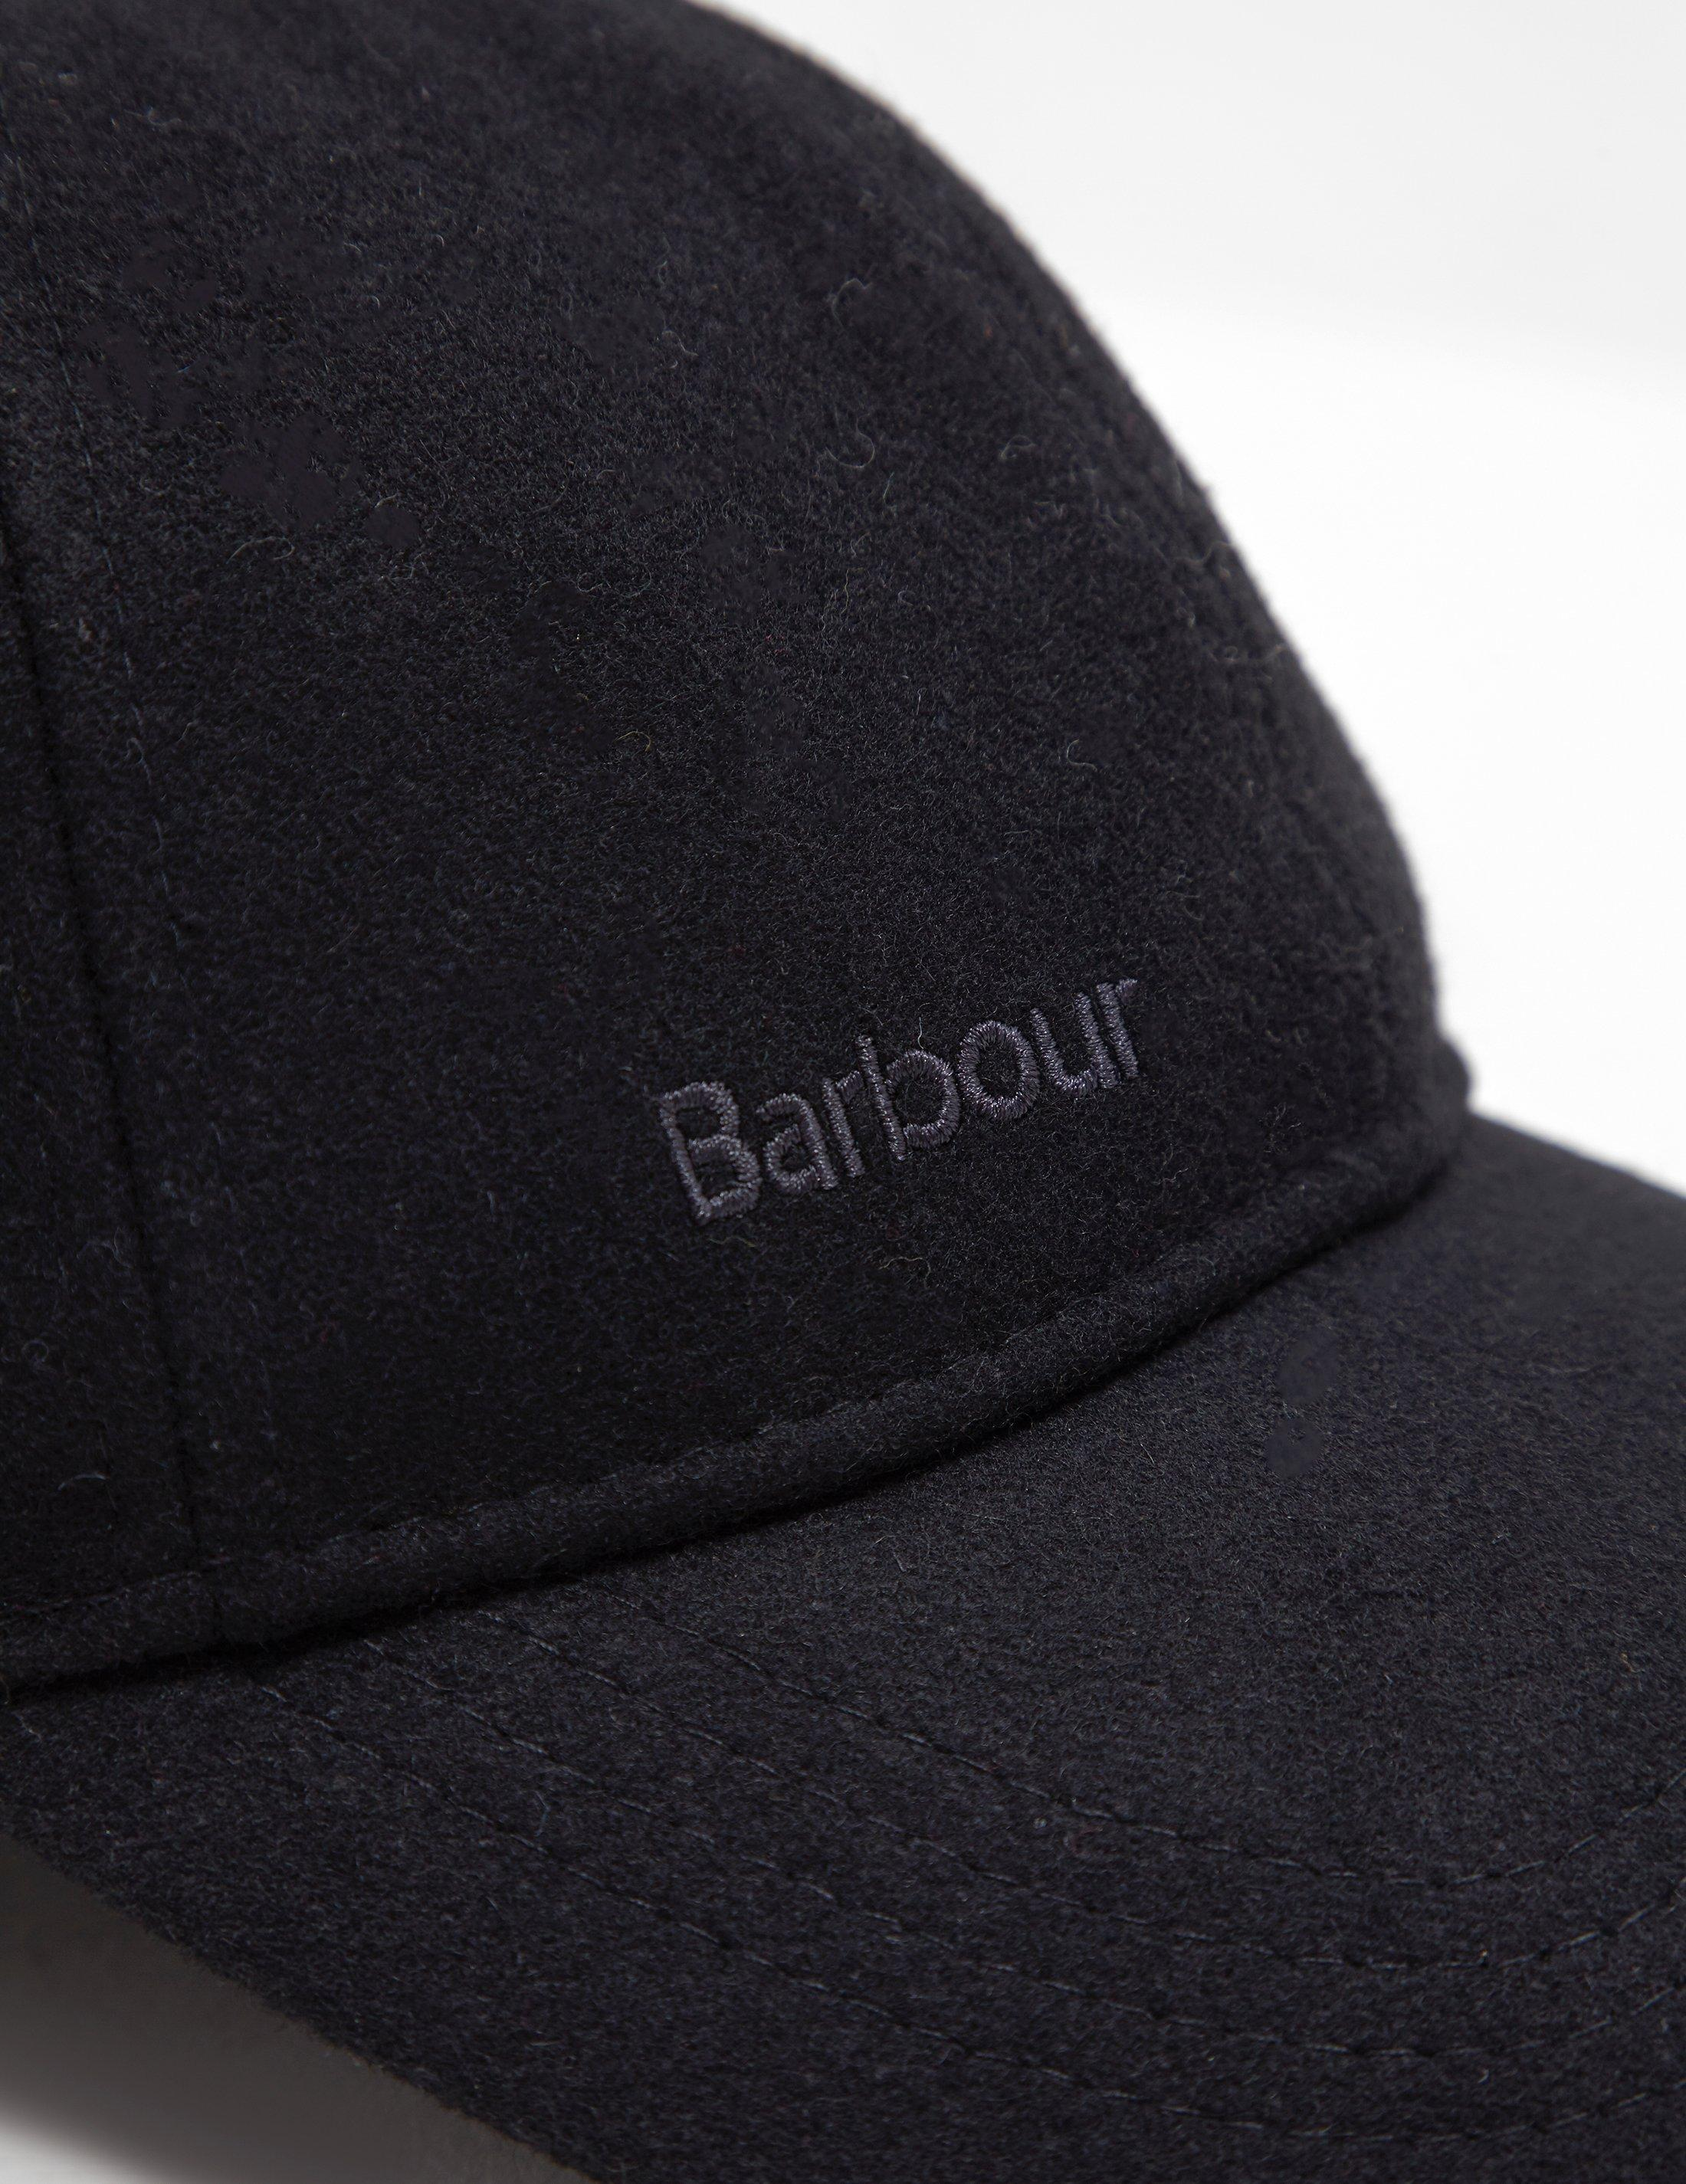 Barbour Mens Coopwortth Cap - Online Exclusive Black in Black for Men - Lyst a971010c96eb